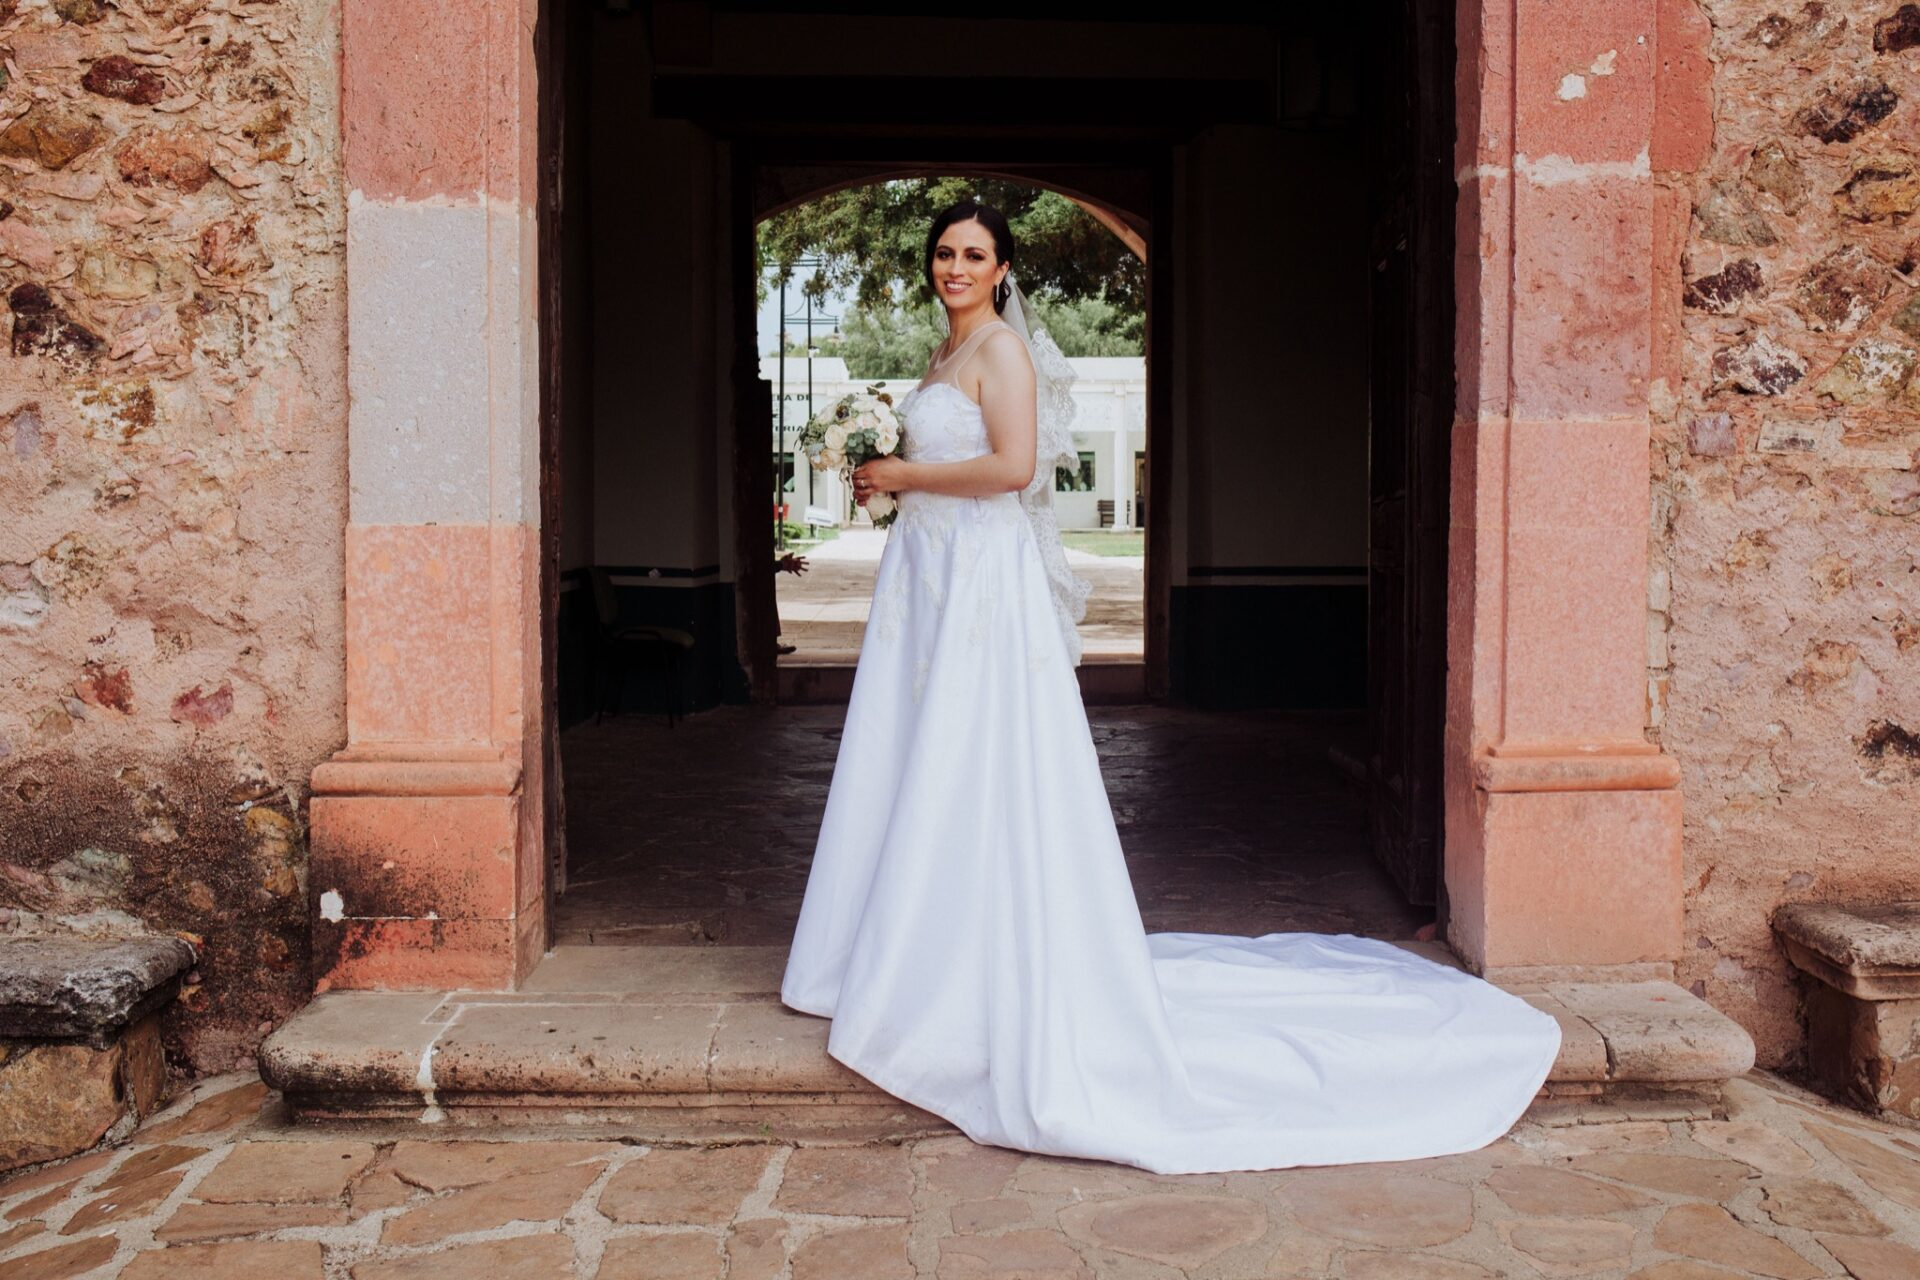 javier_noriega_fotografo_bodas_centro_platero_zacatecas_wedding_photographer25